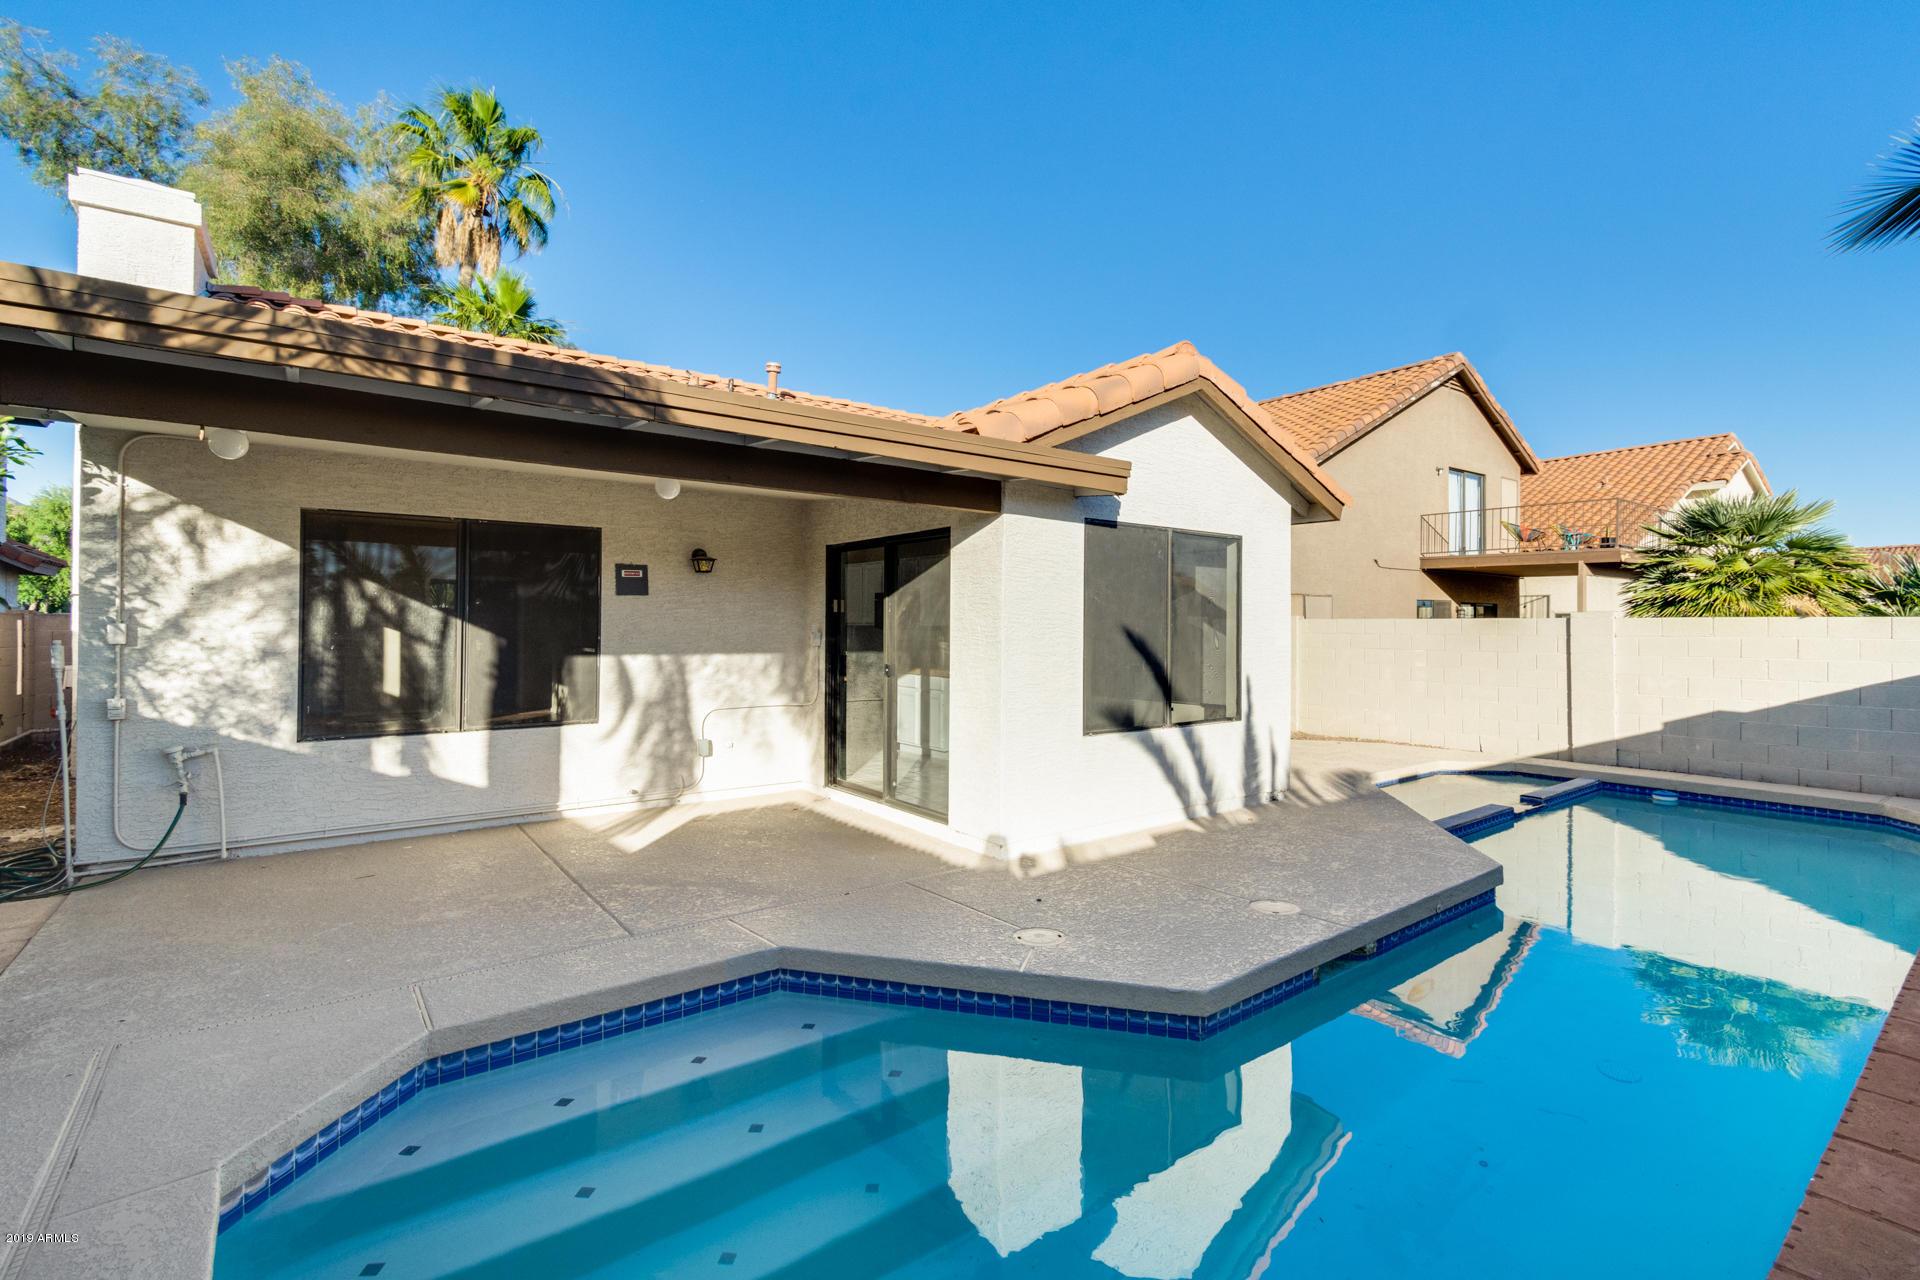 MLS 5931438 13430 N 103RD Place, Scottsdale, AZ 85260 Scottsdale AZ Private Pool